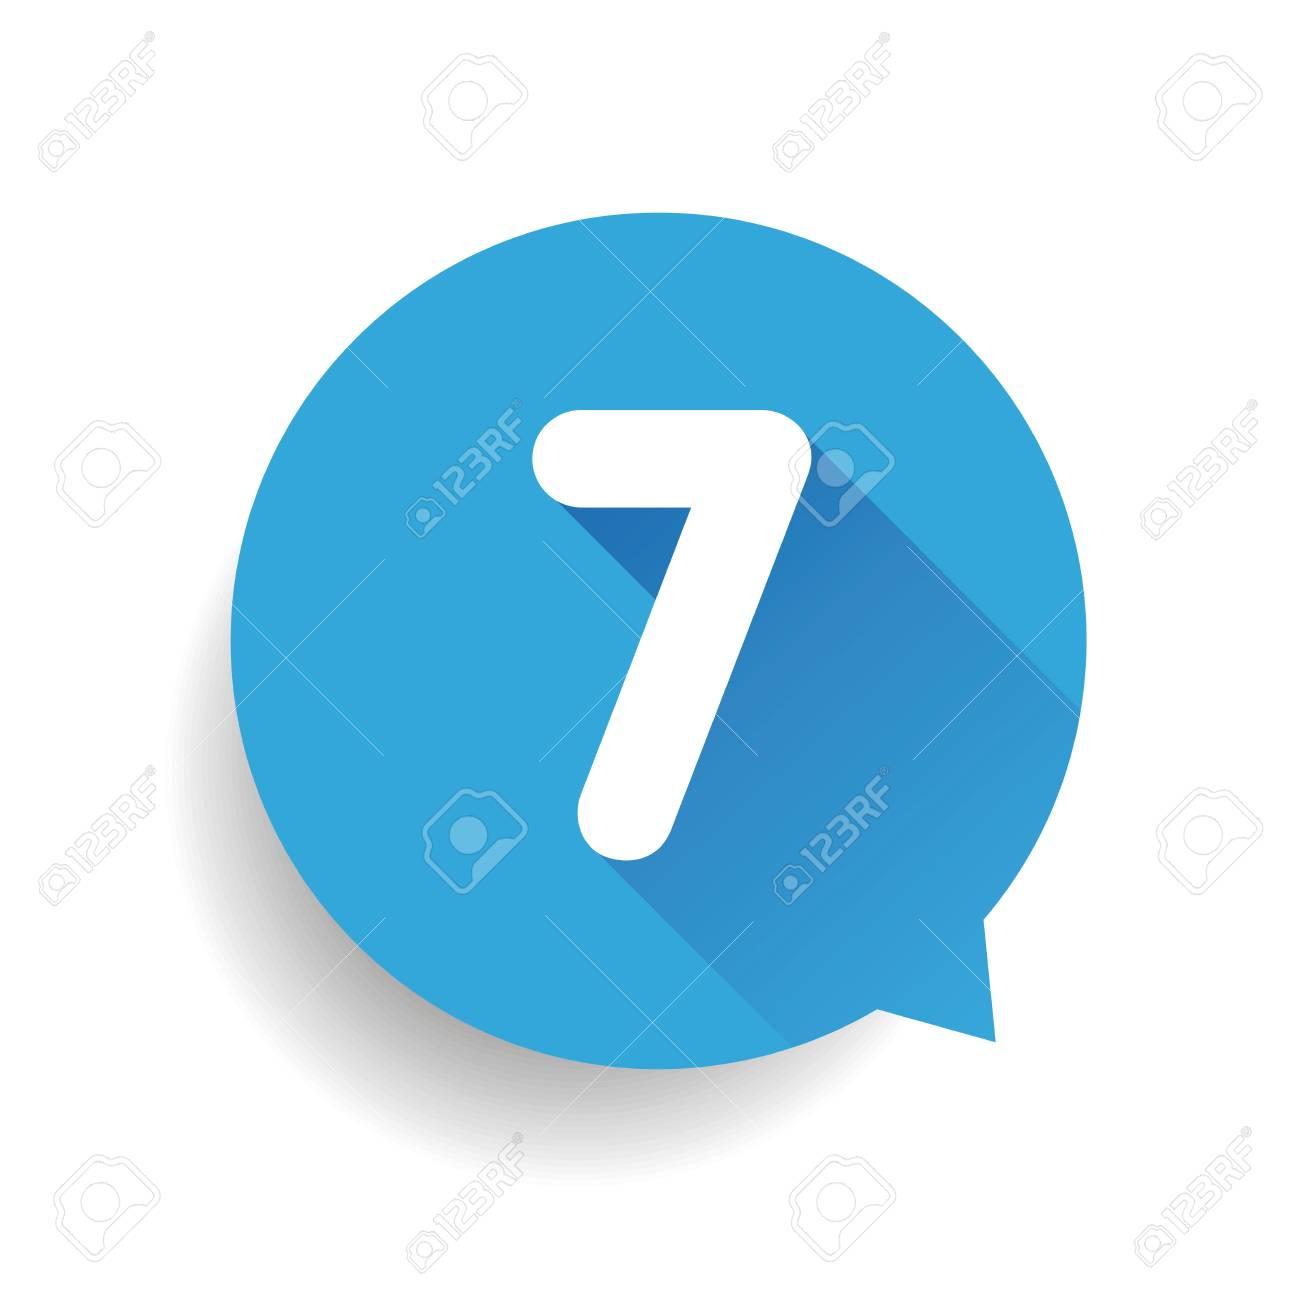 Number seven 7 speech bubble blue - 57365404